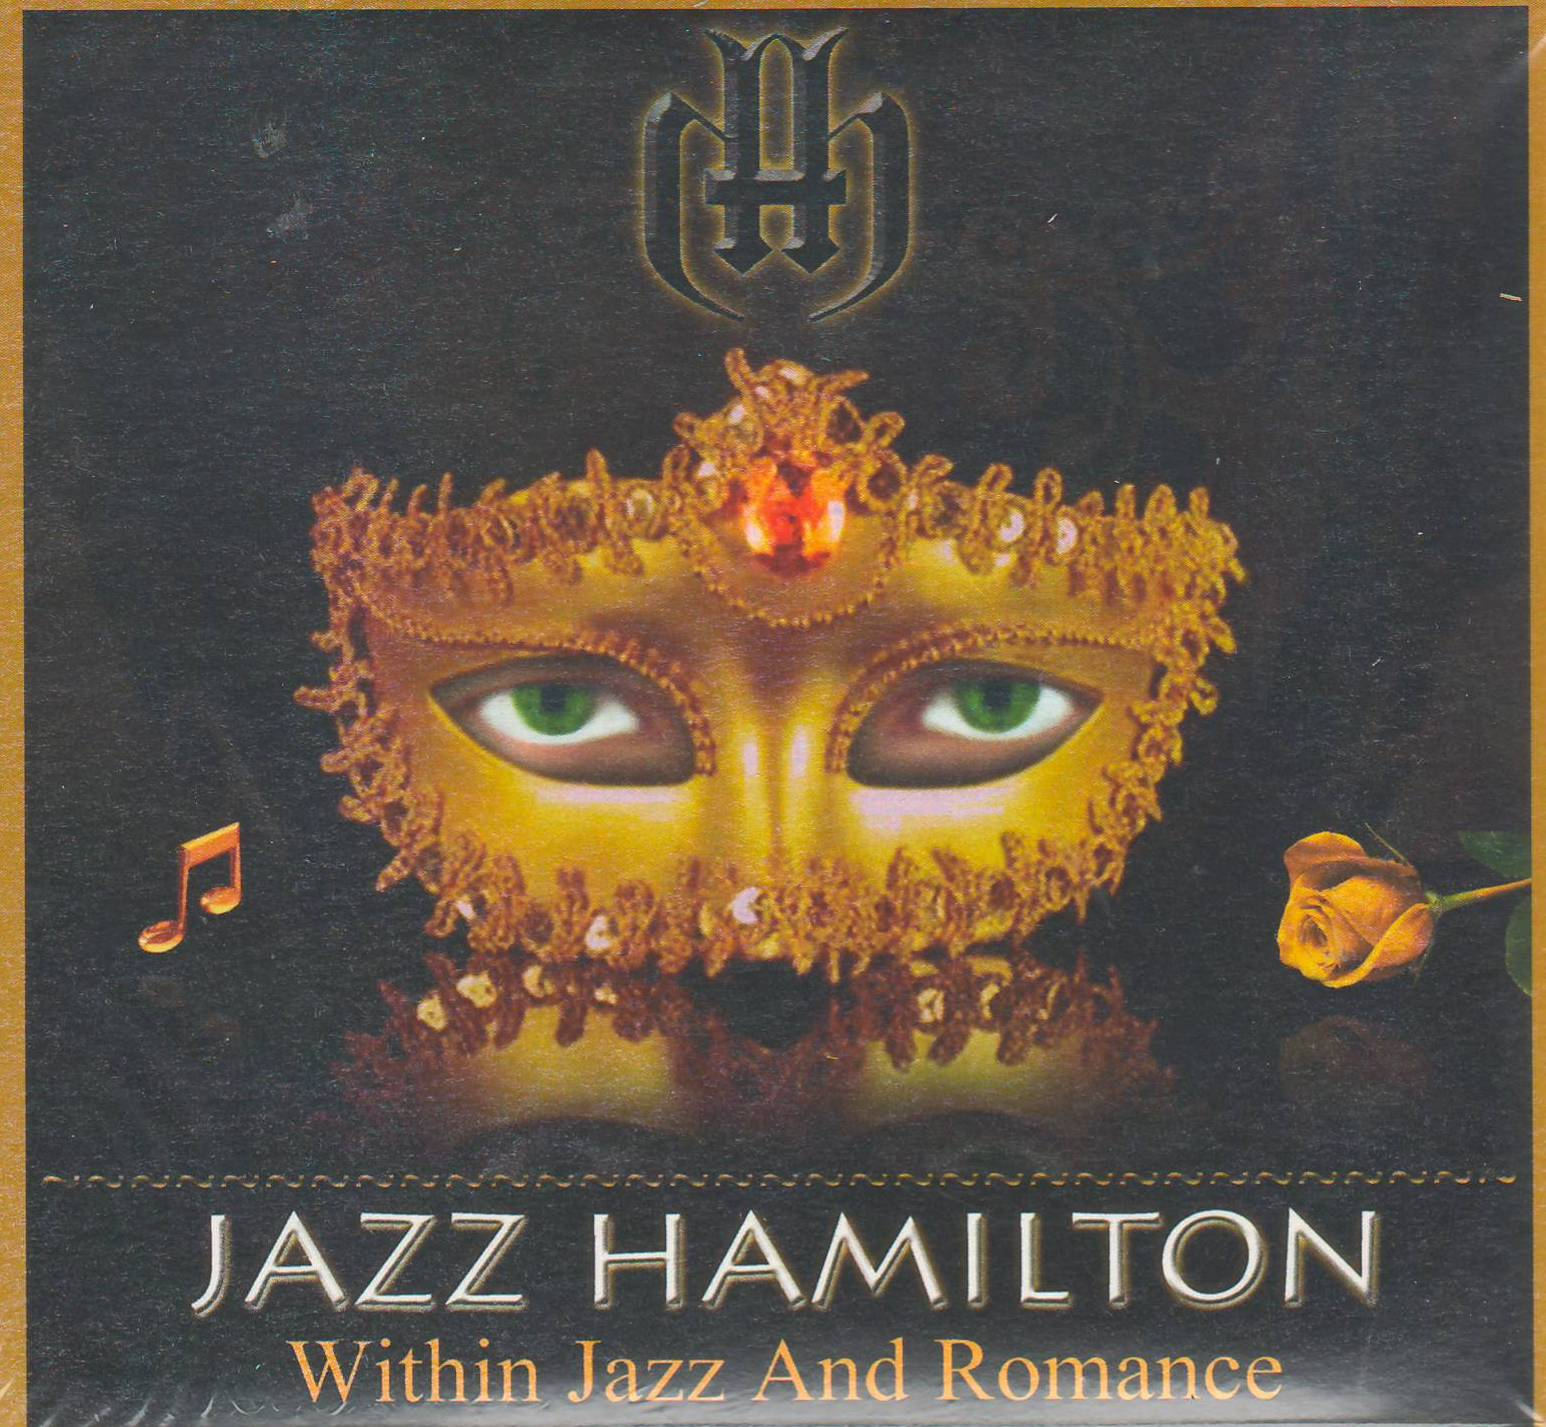 jazz hamilton within jazz and romance